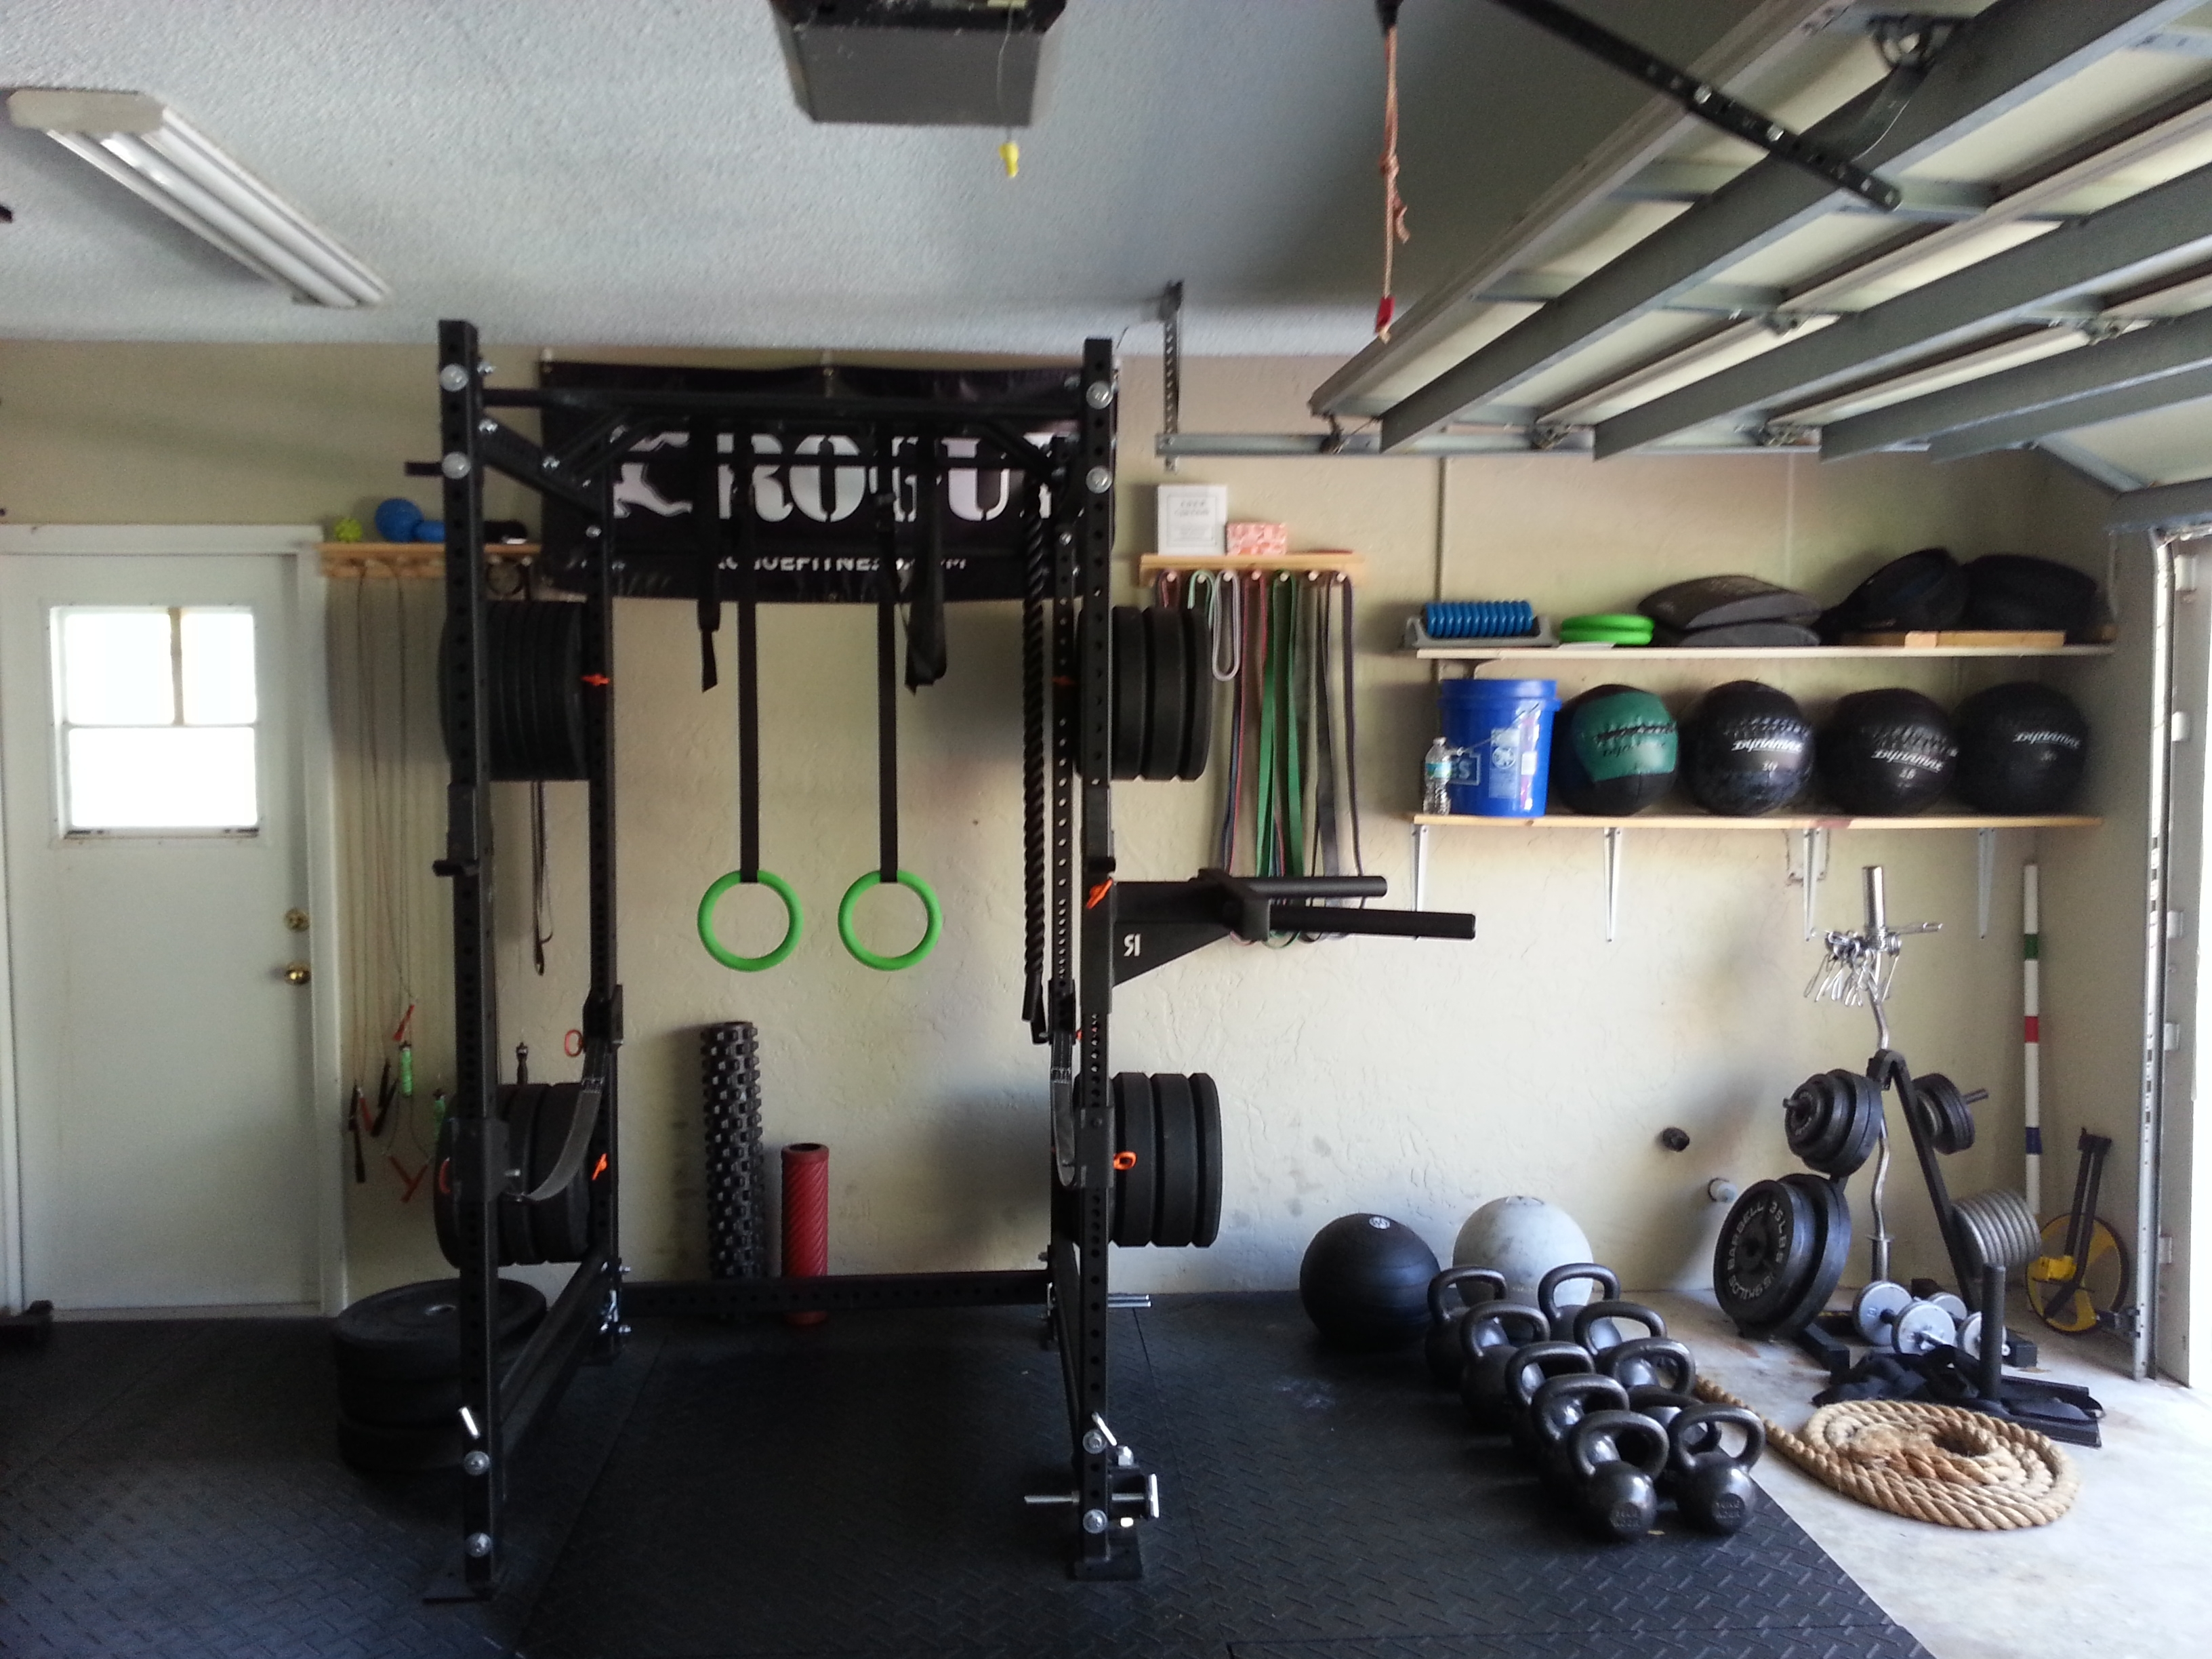 Diy garage gym ideas : rickyhil outdoor ideas very useful garage